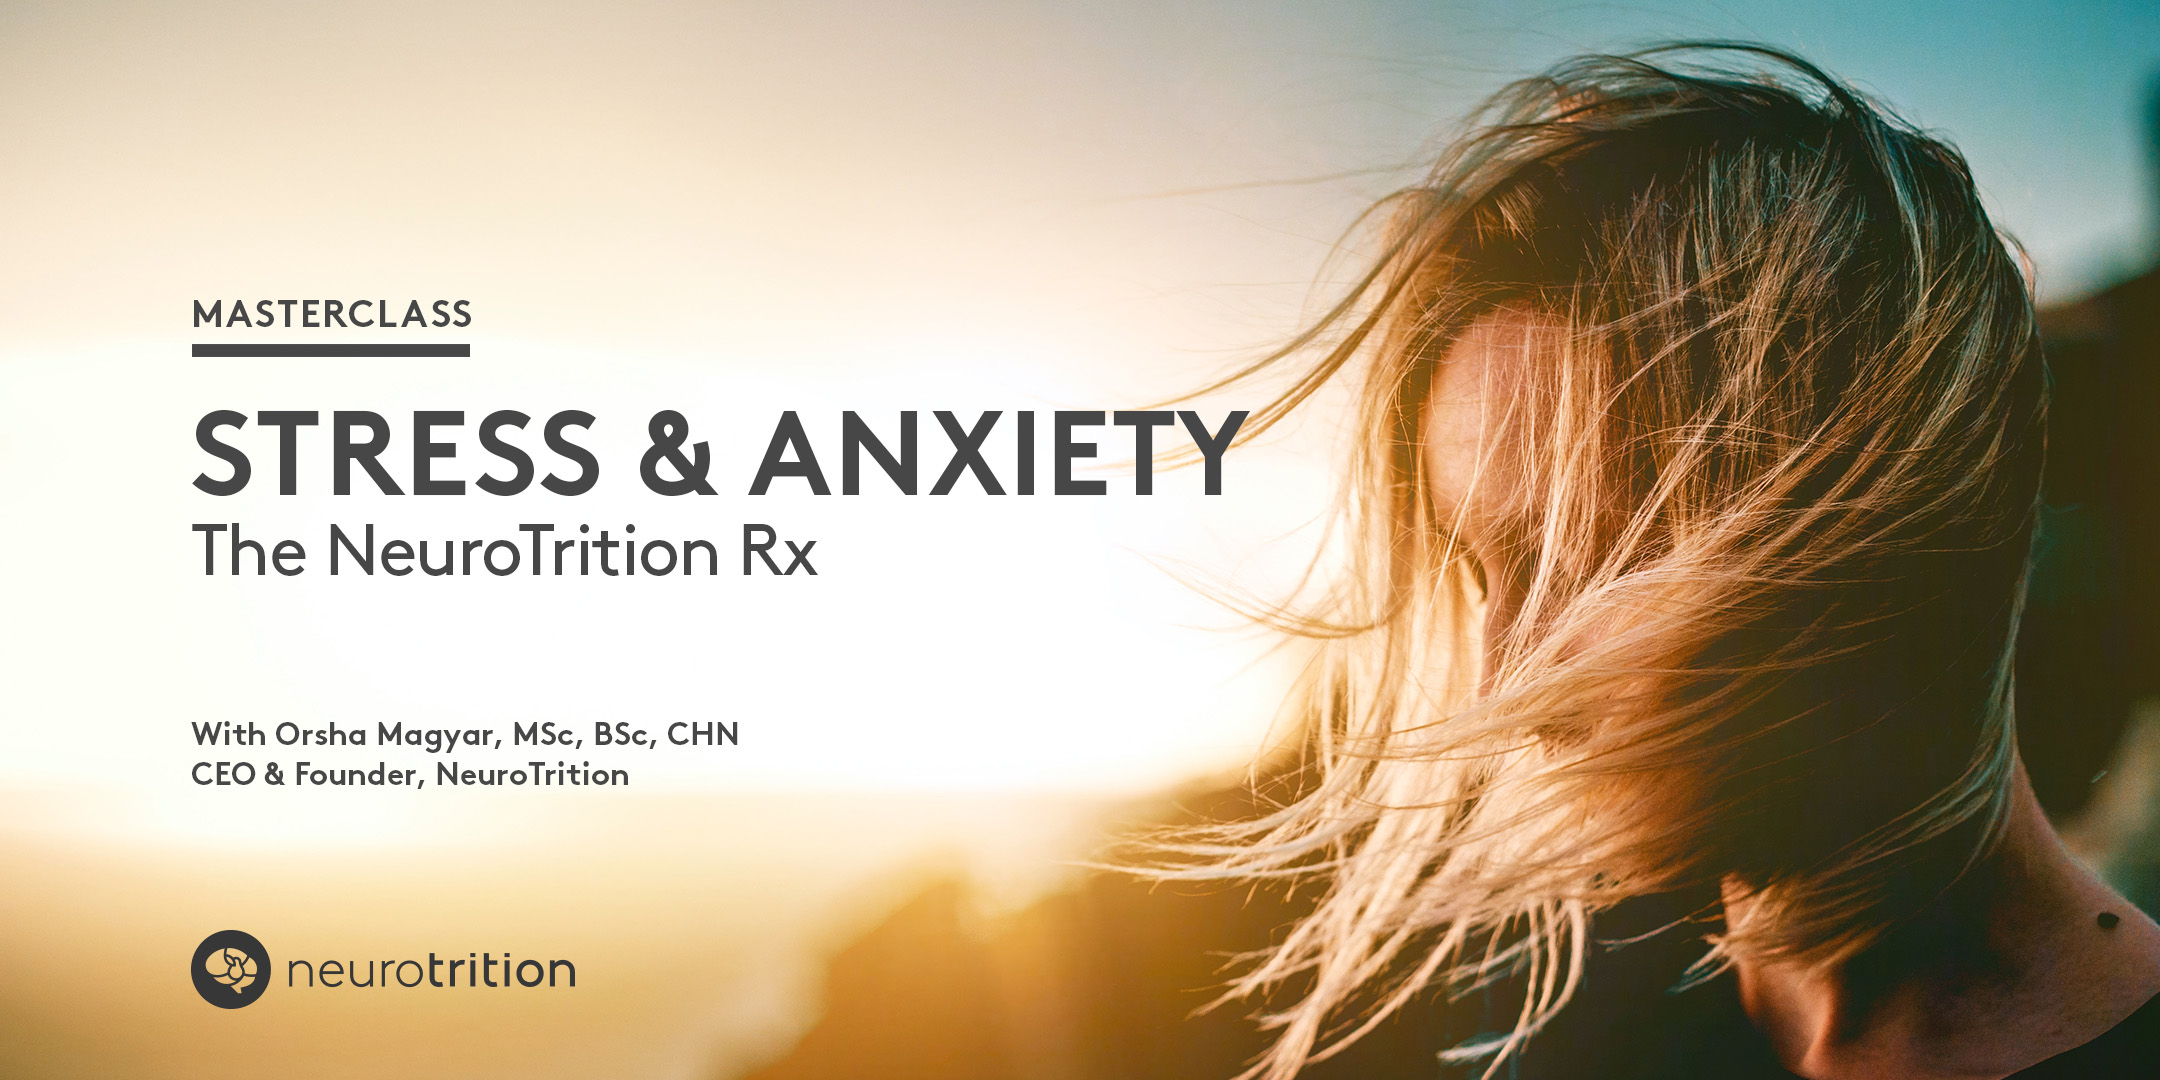 Stress & Anxiety: The NeuroTrition Rx Masterclass Photo